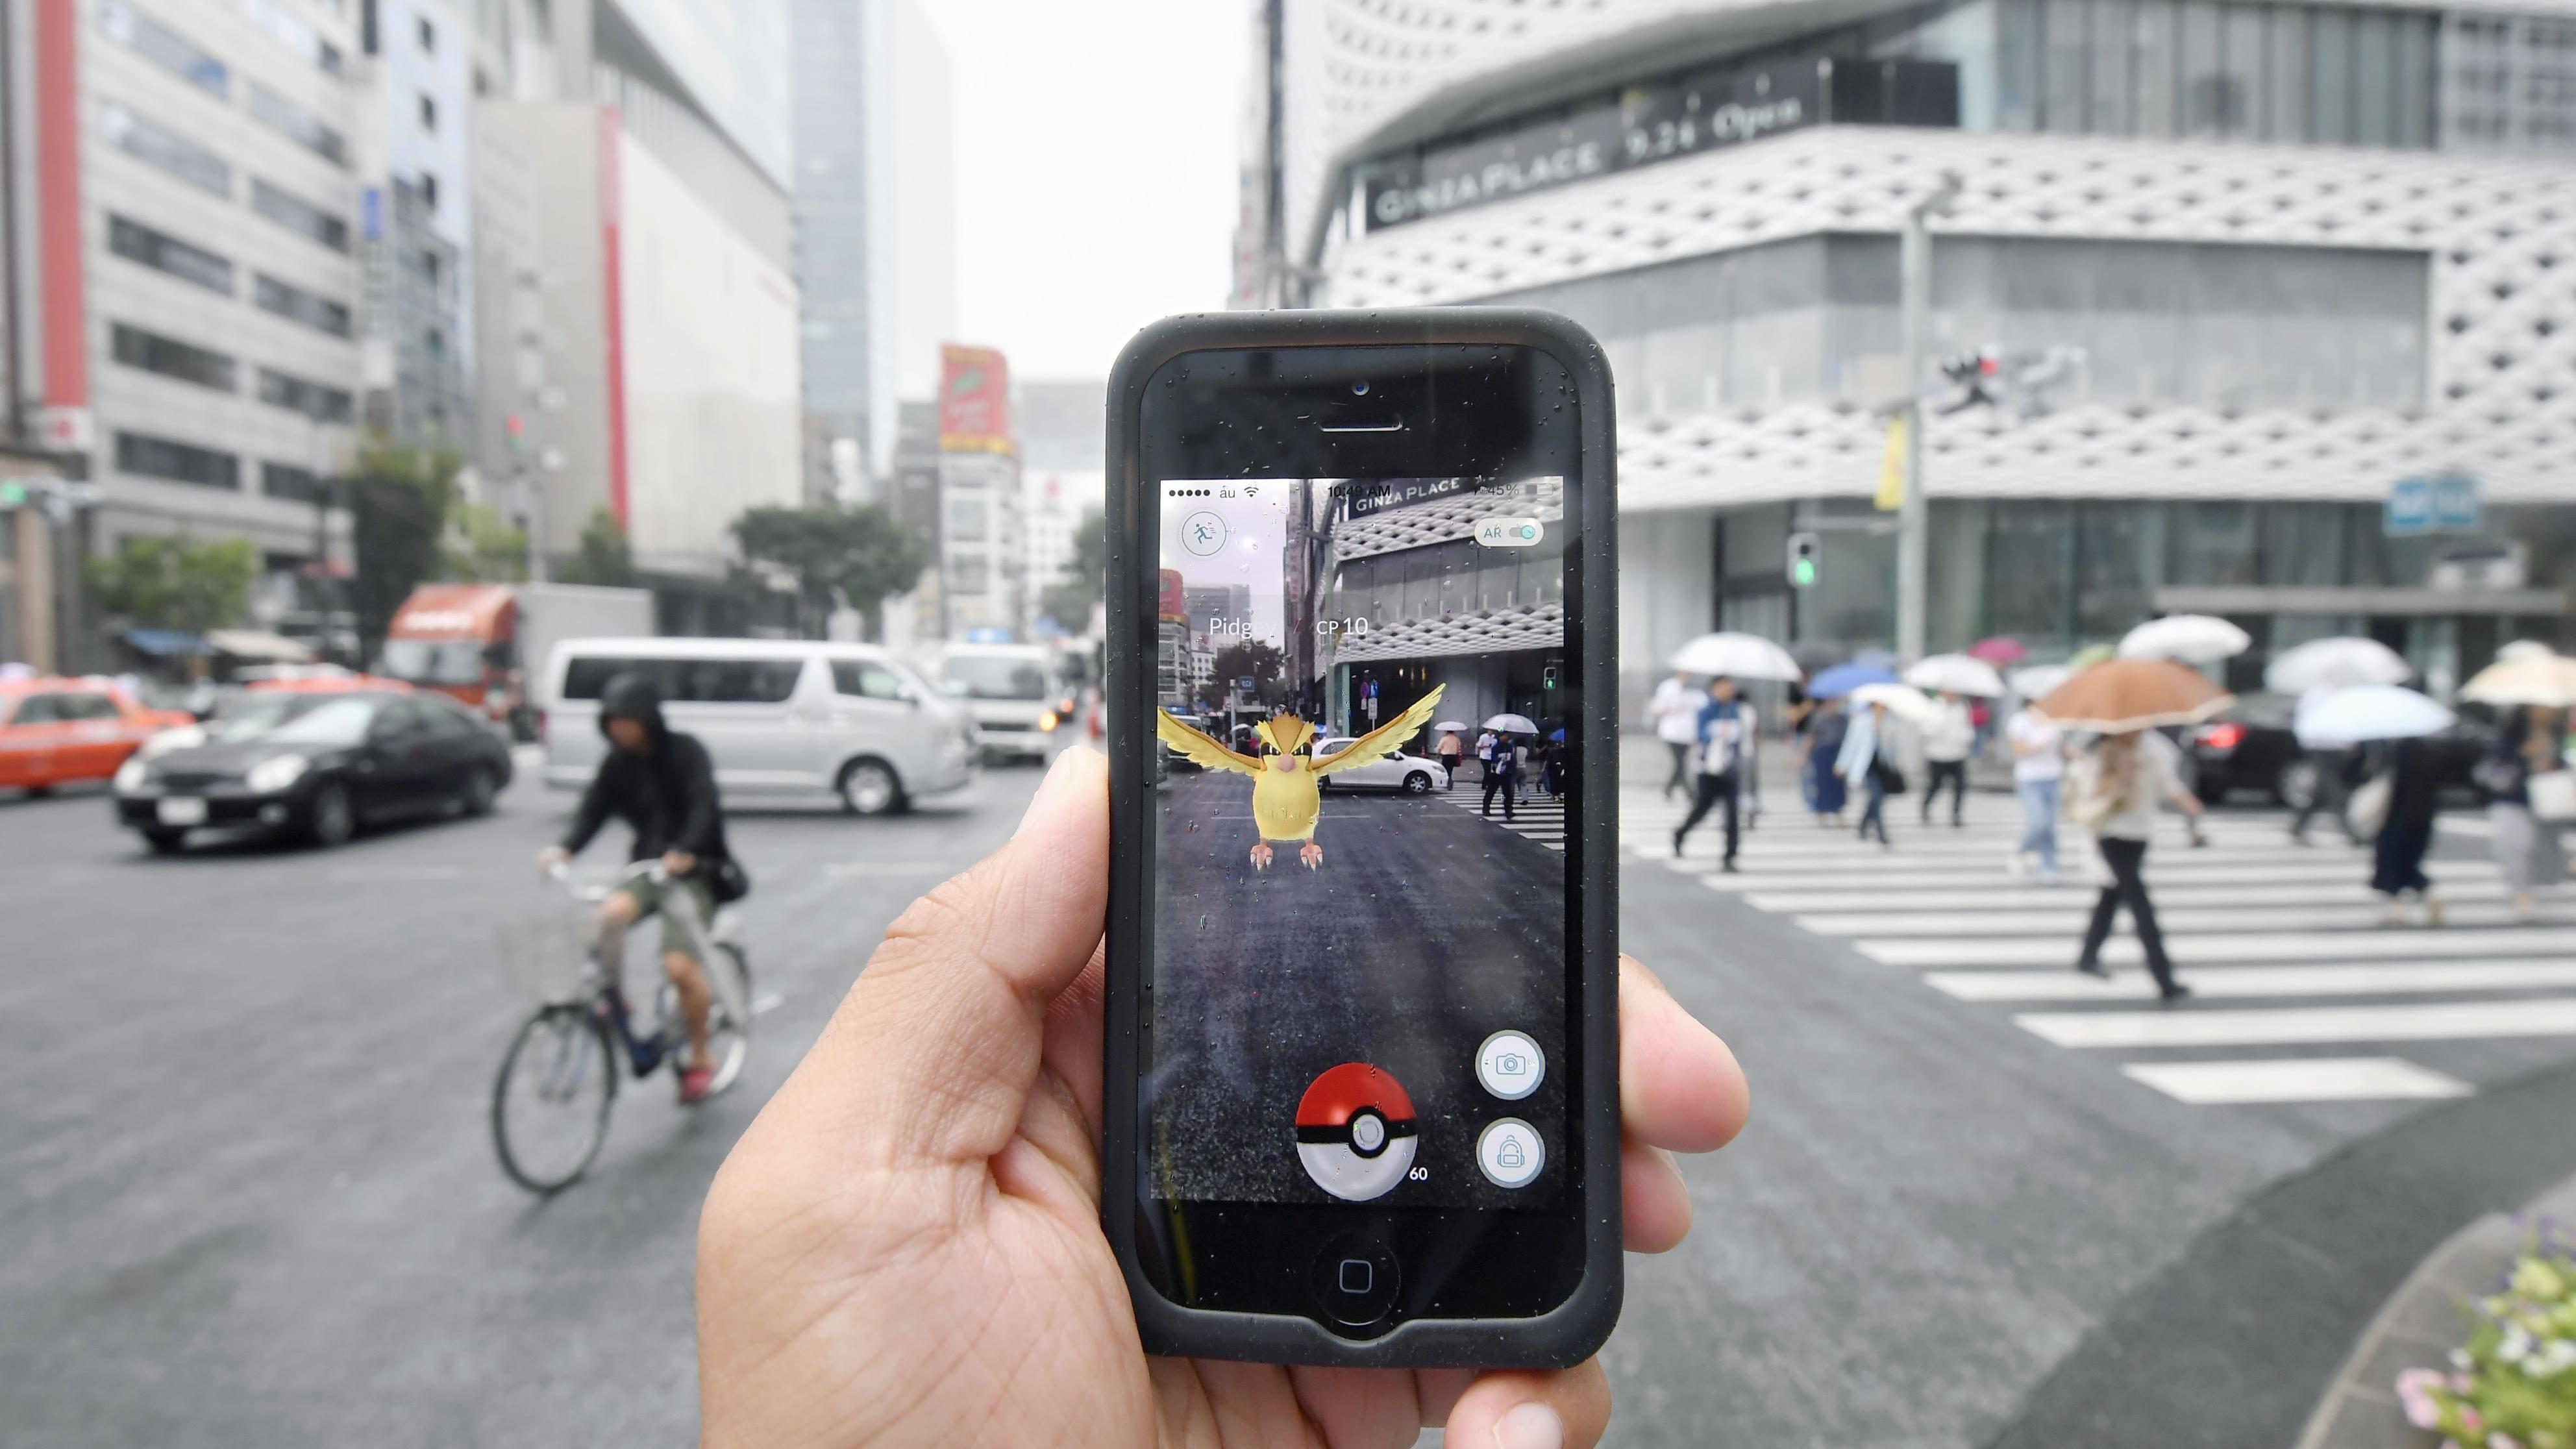 XL Bonbons in Pokémon GO nutzen